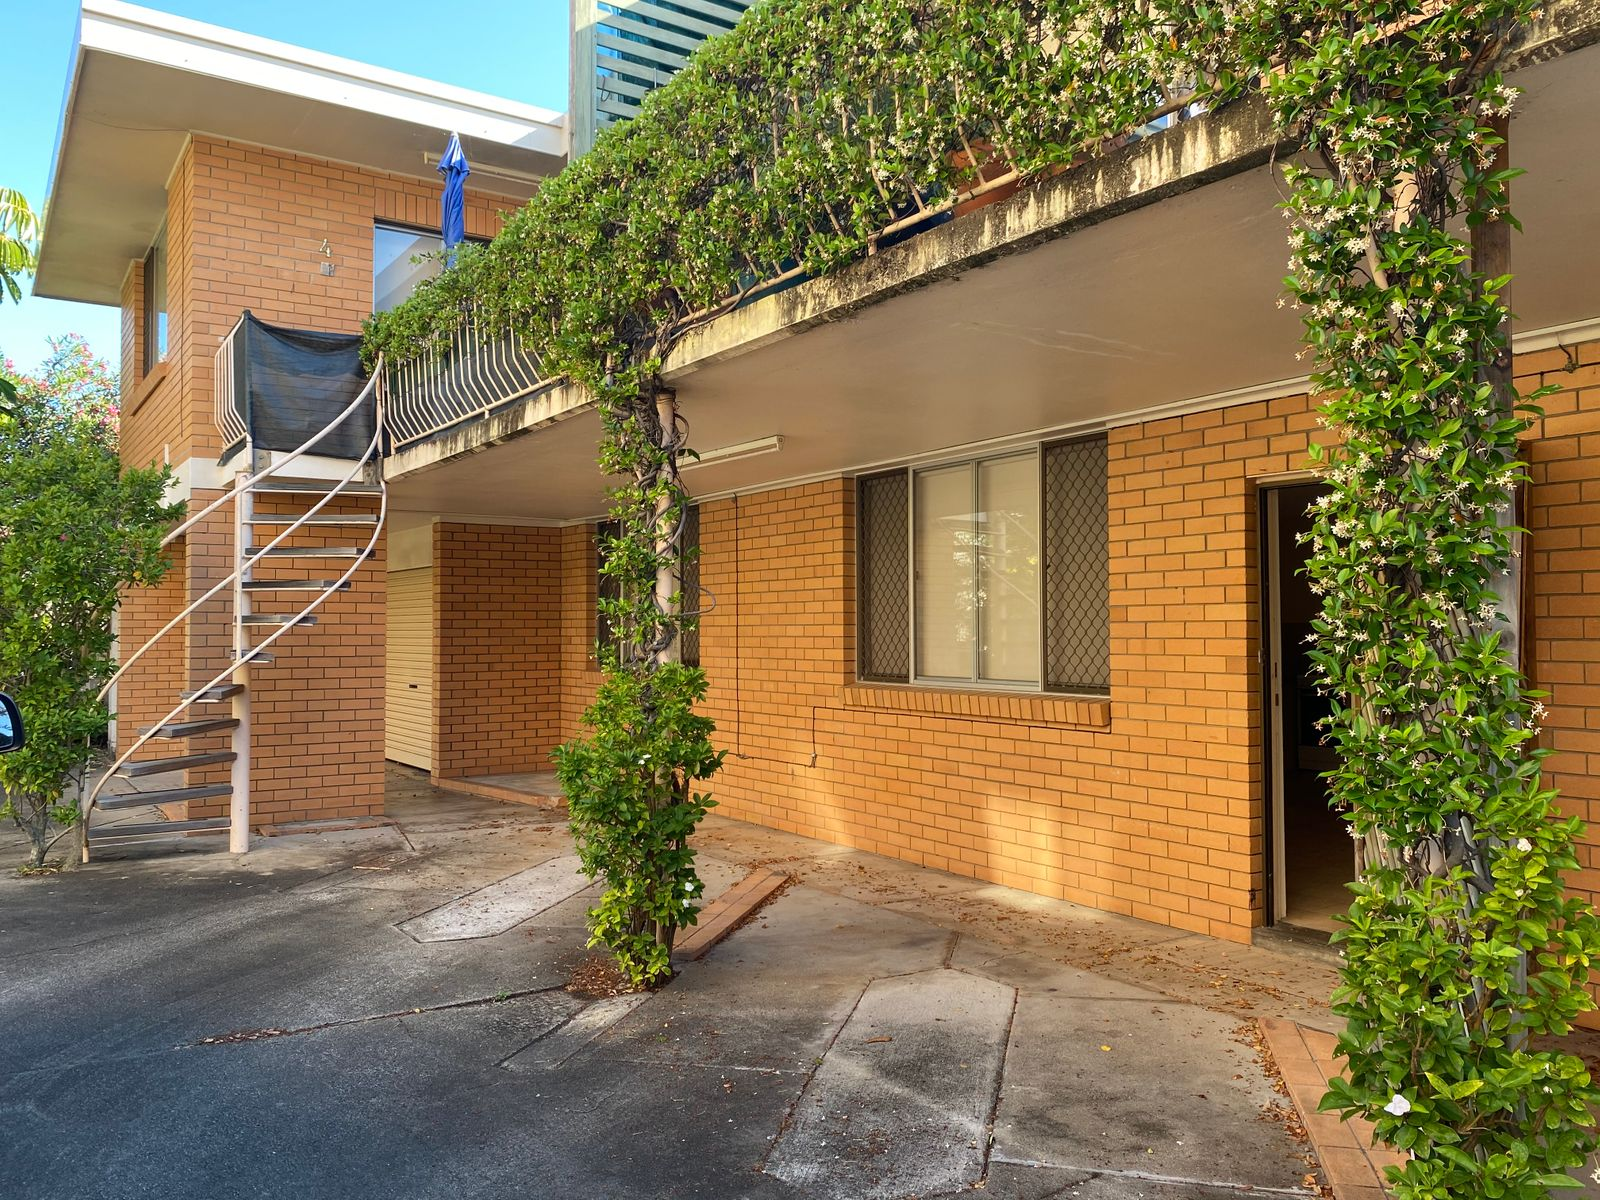 2/8 Kalyan Street, Chevron Island, QLD 4217